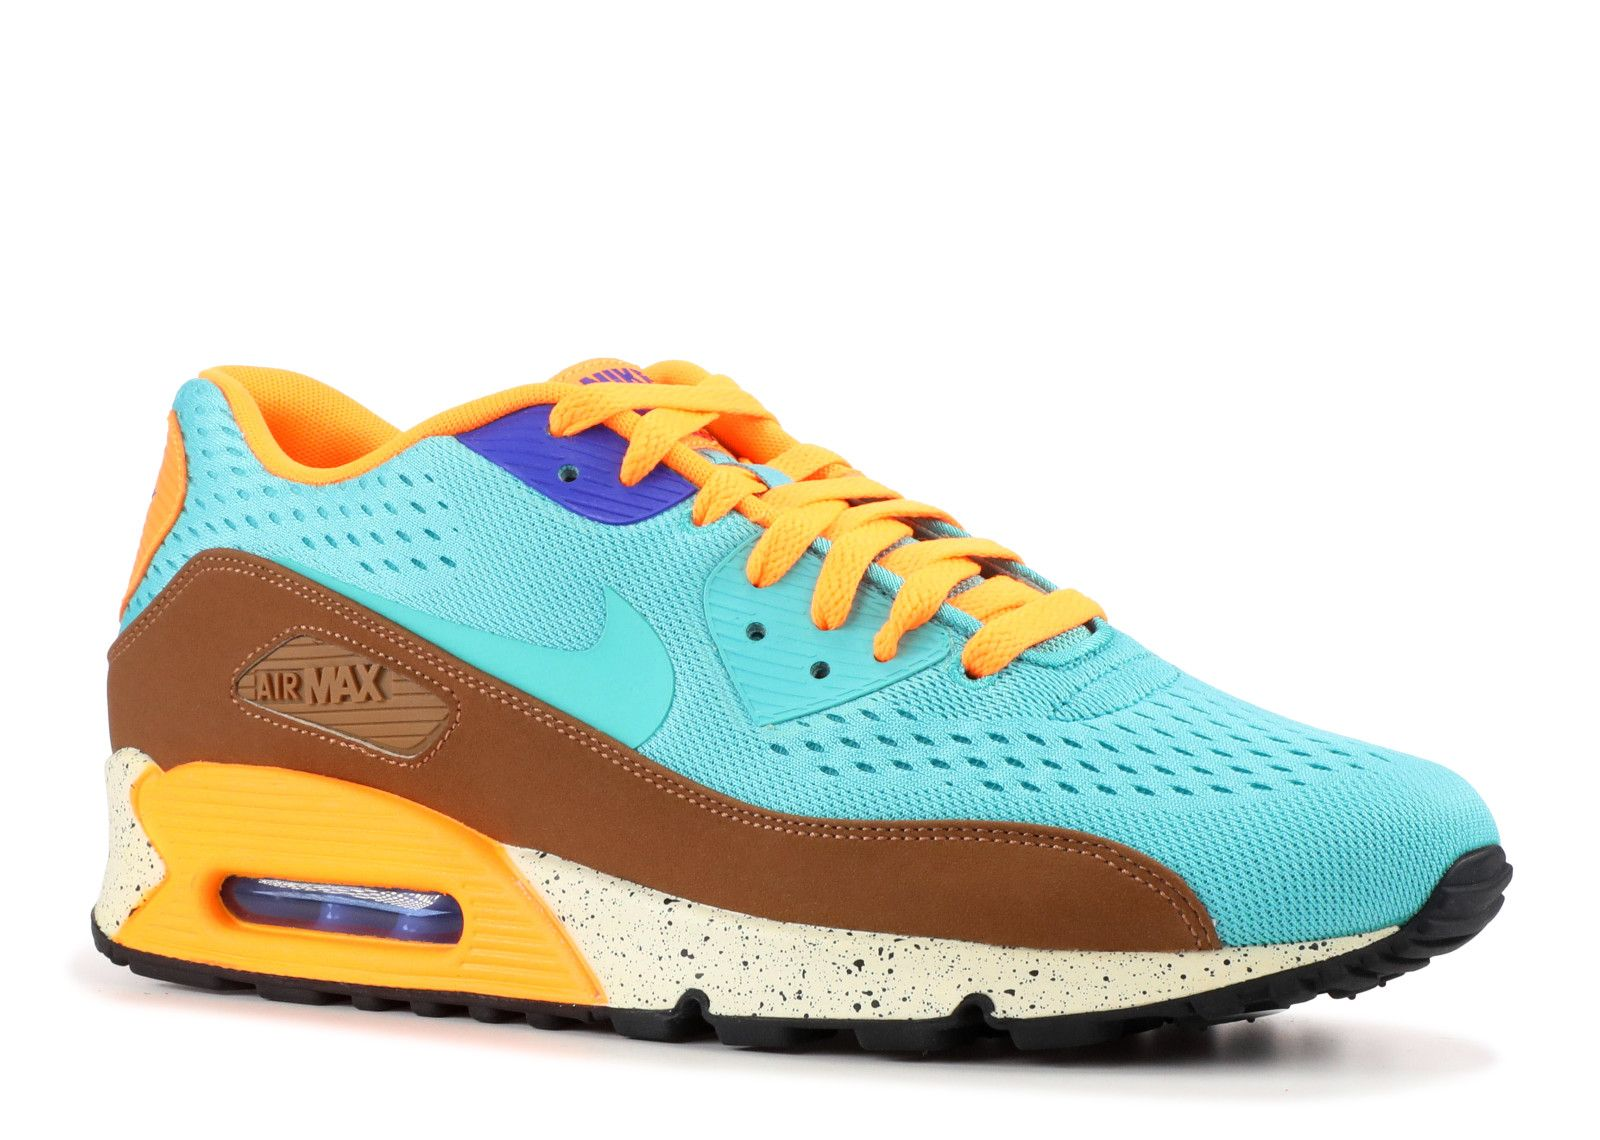 the latest 9b2cb 8810f Price Nike Air Max 90 Em